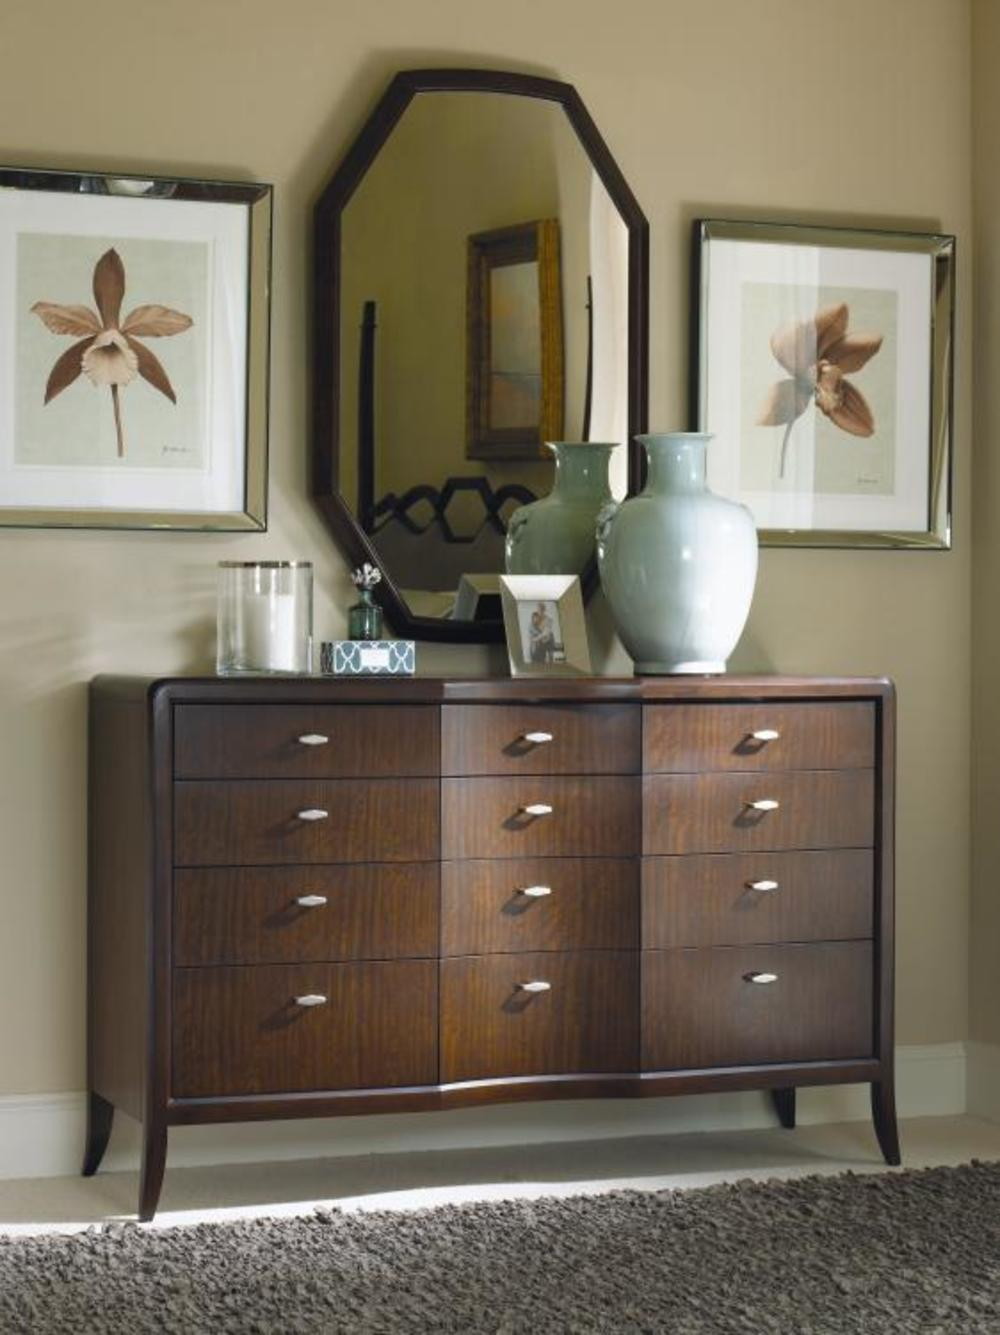 Century Furniture - Paragon Club Dufrene Dresser